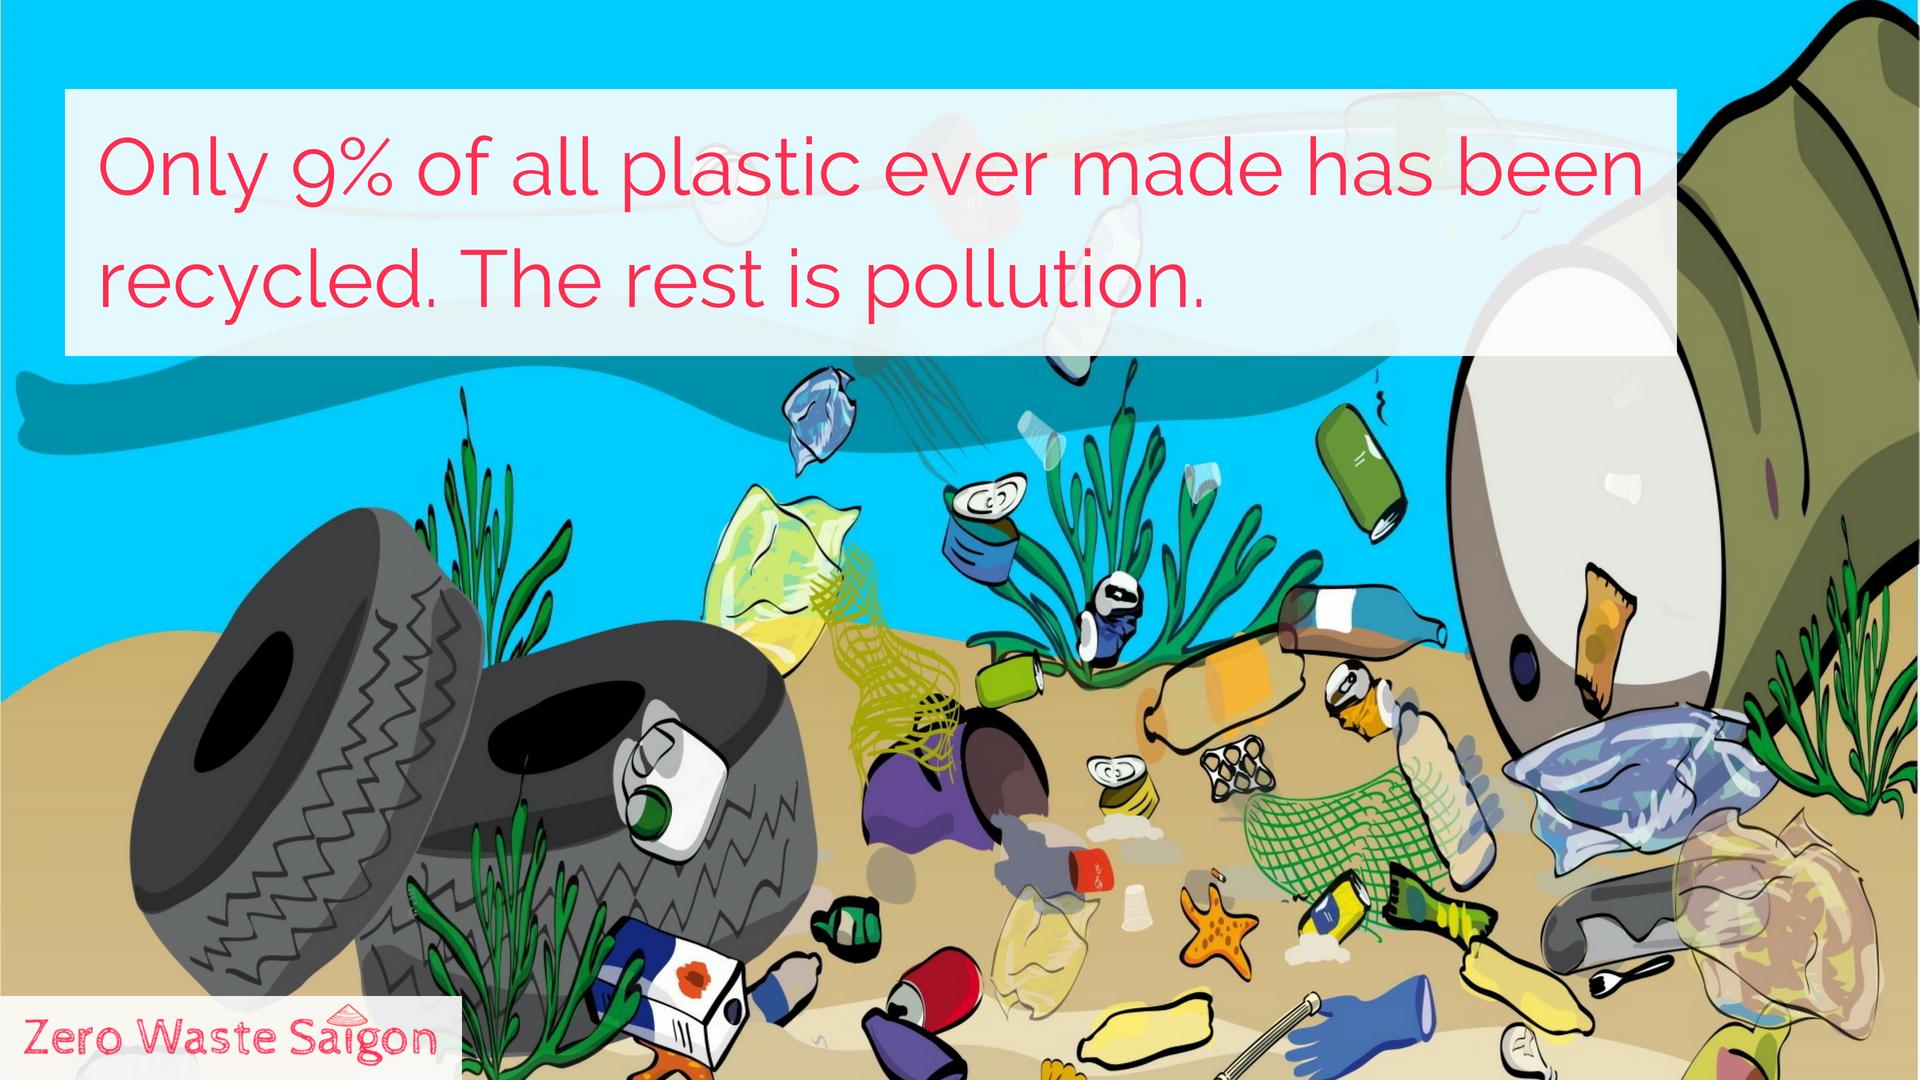 Zero Waste Saigon presentation slide 4